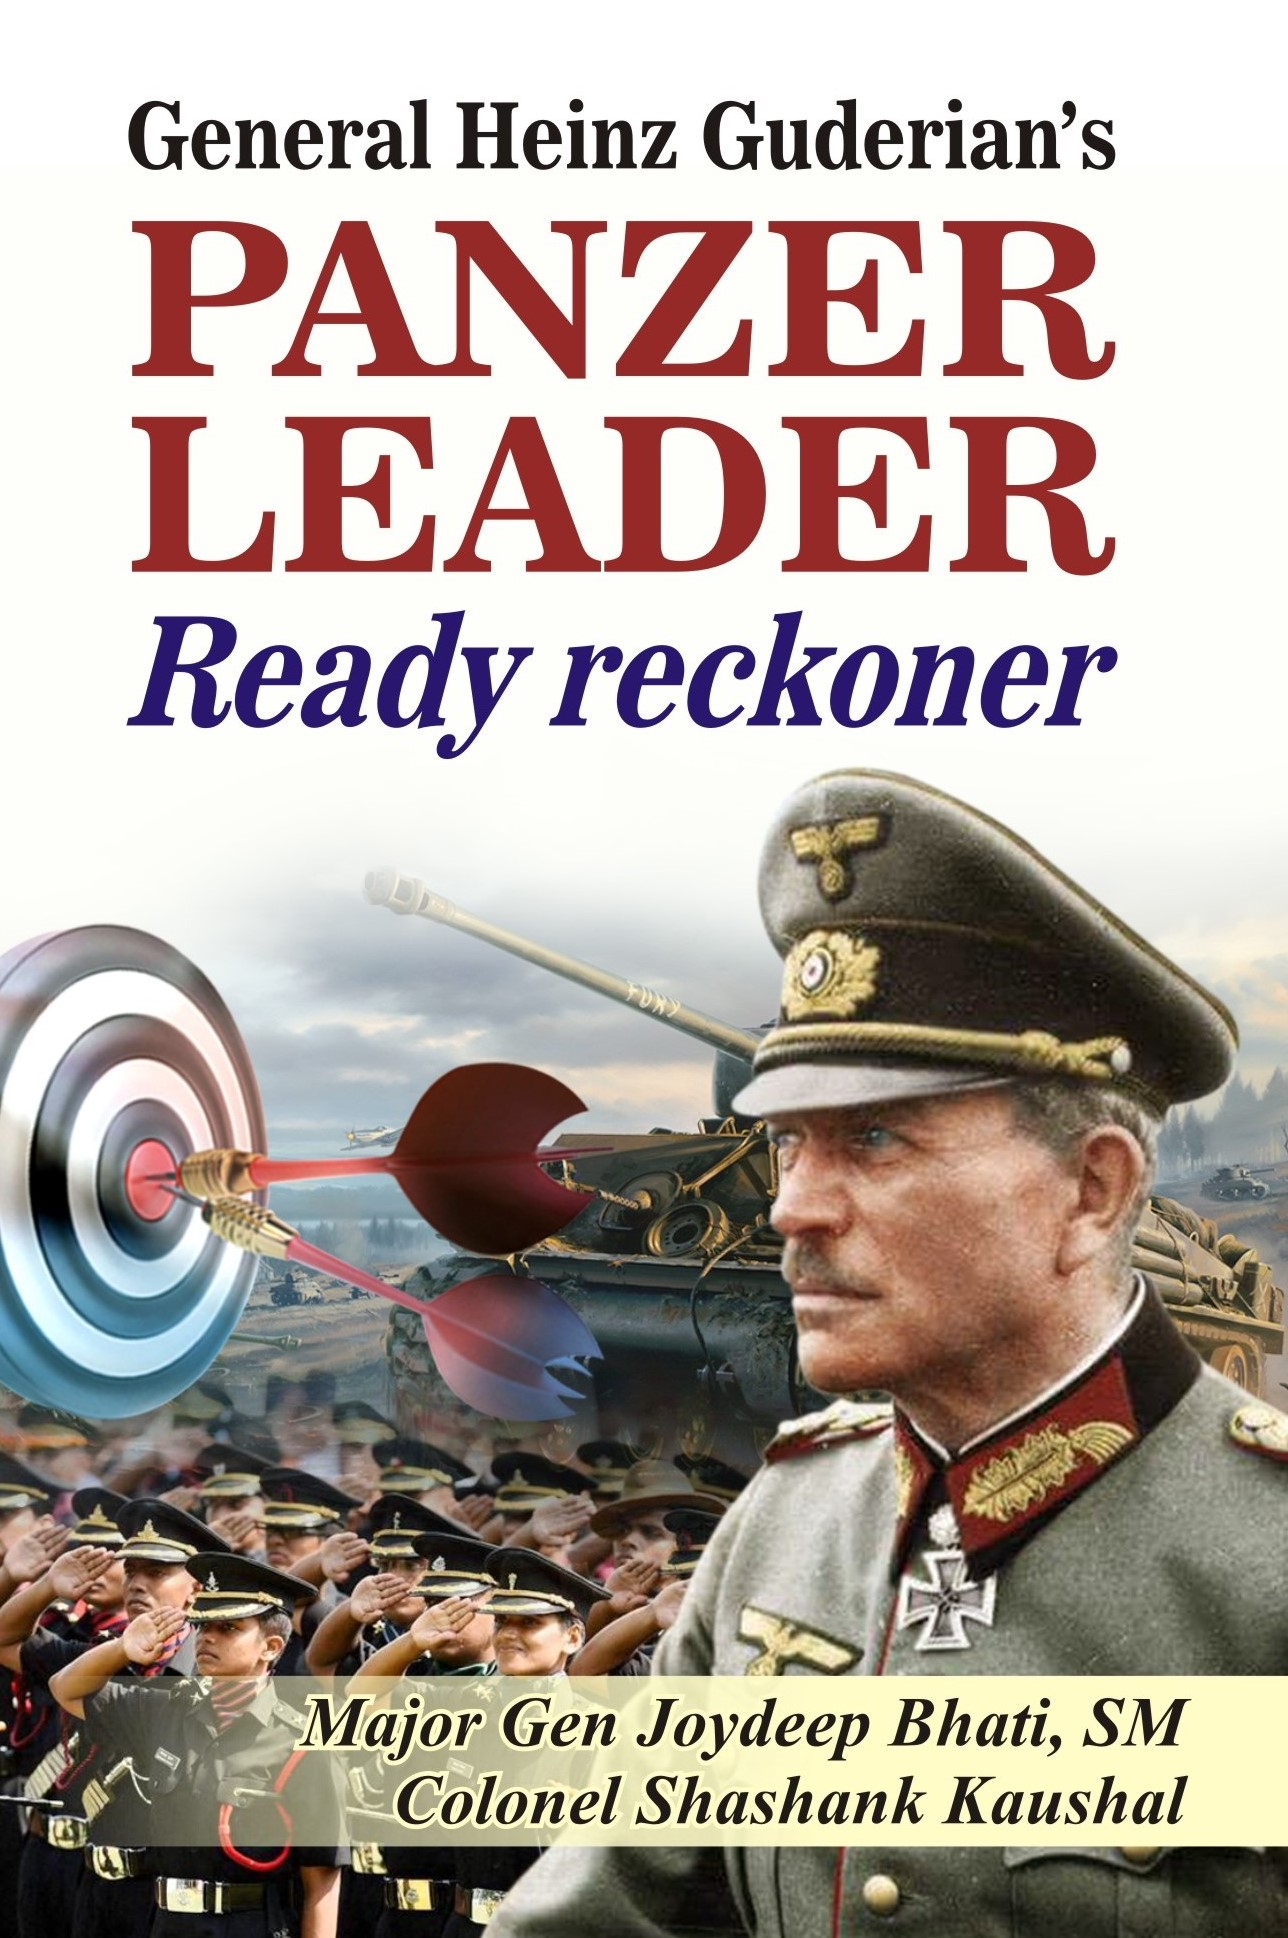 General Heinz Guderian's Panzer Leader Ready Rackoner